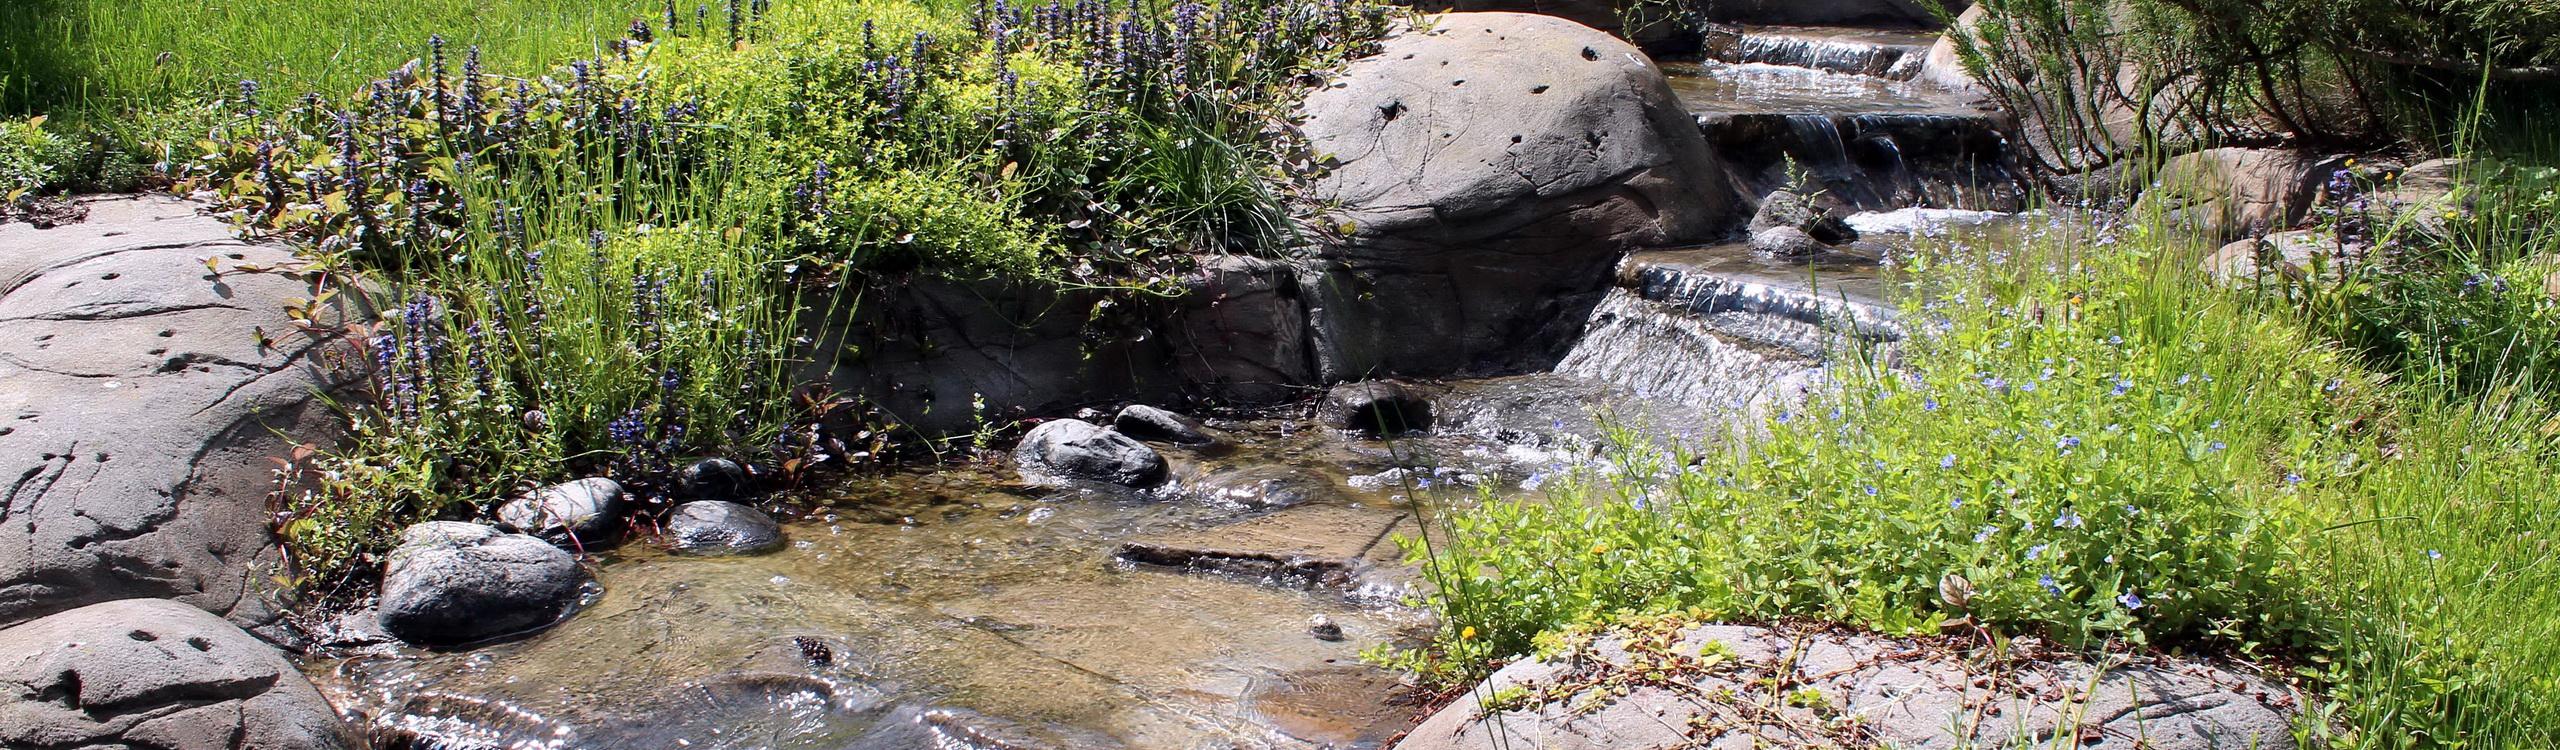 На склоне у ручья